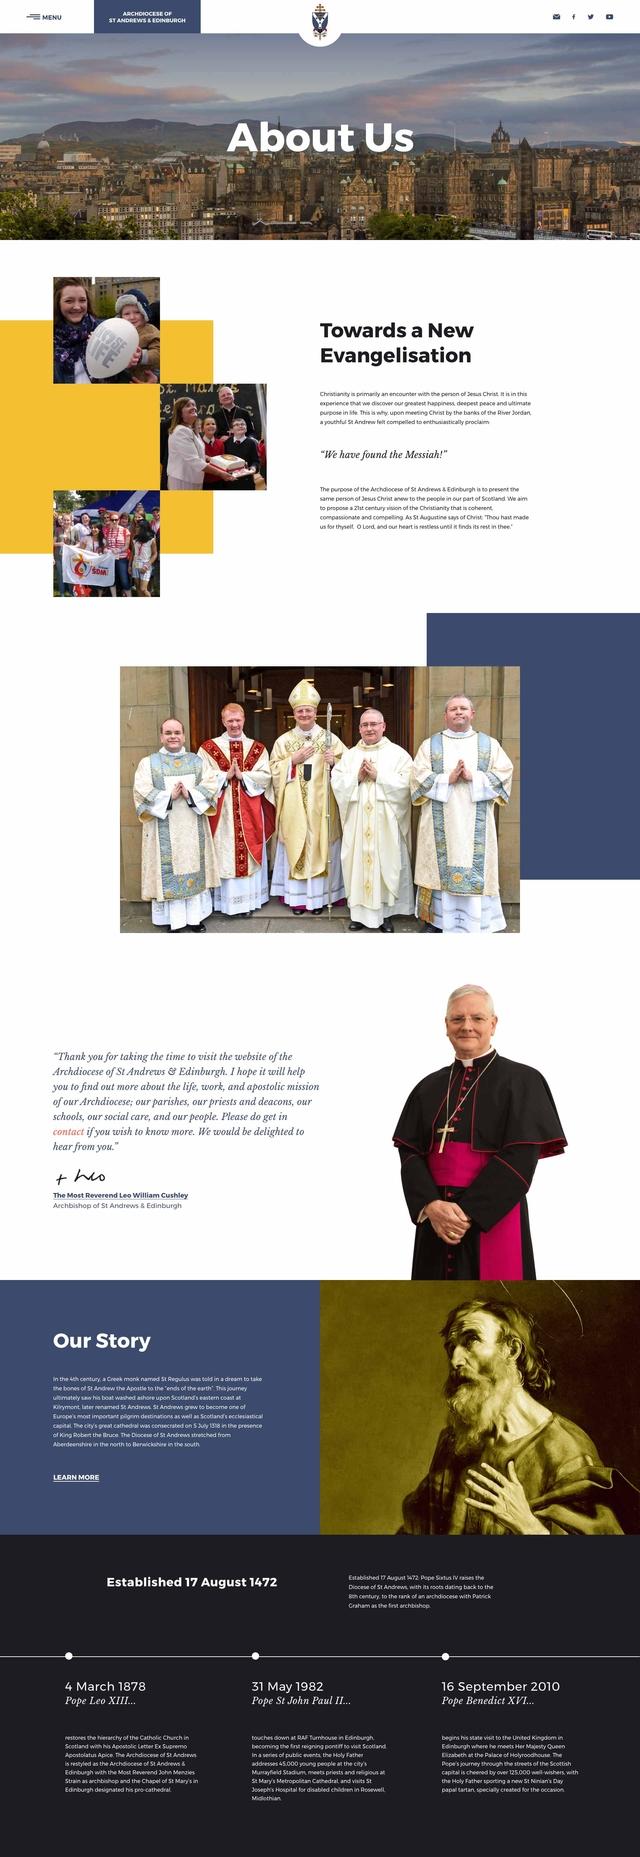 Archdiocese of Edinburgh